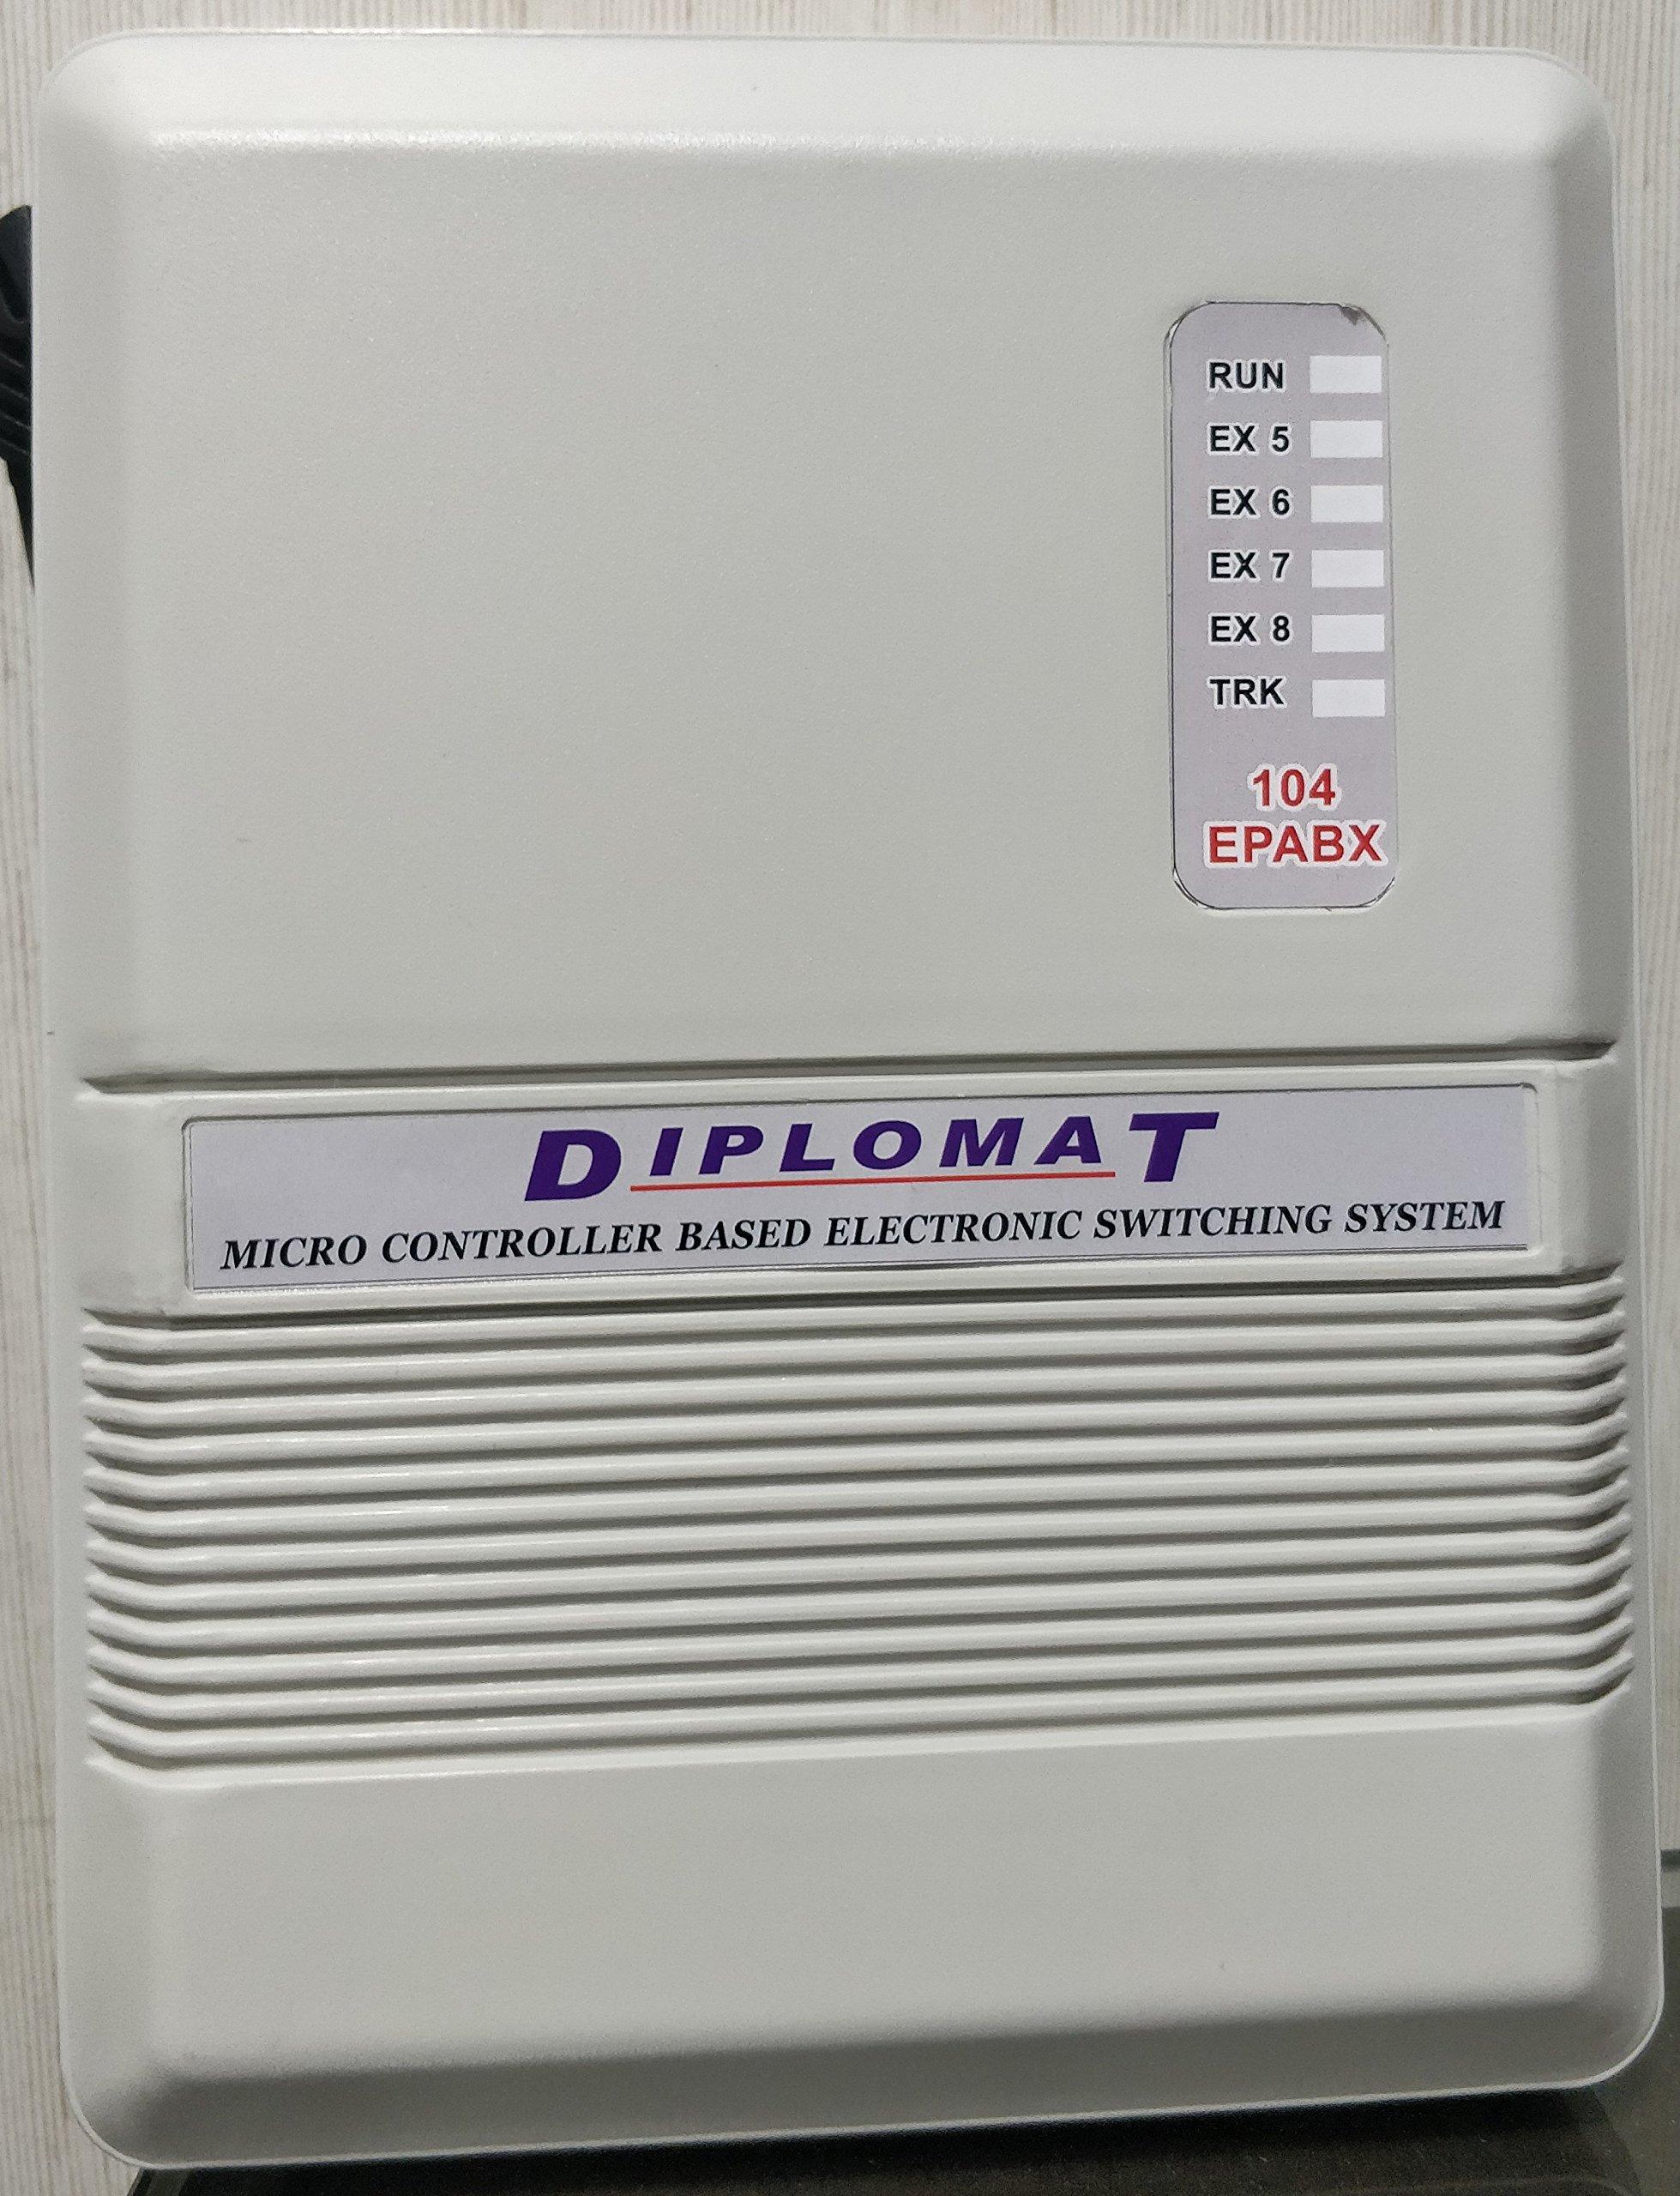 Diplomat Epabx 104 Intercom System Buy Online In Zimbabwe At Desertcart